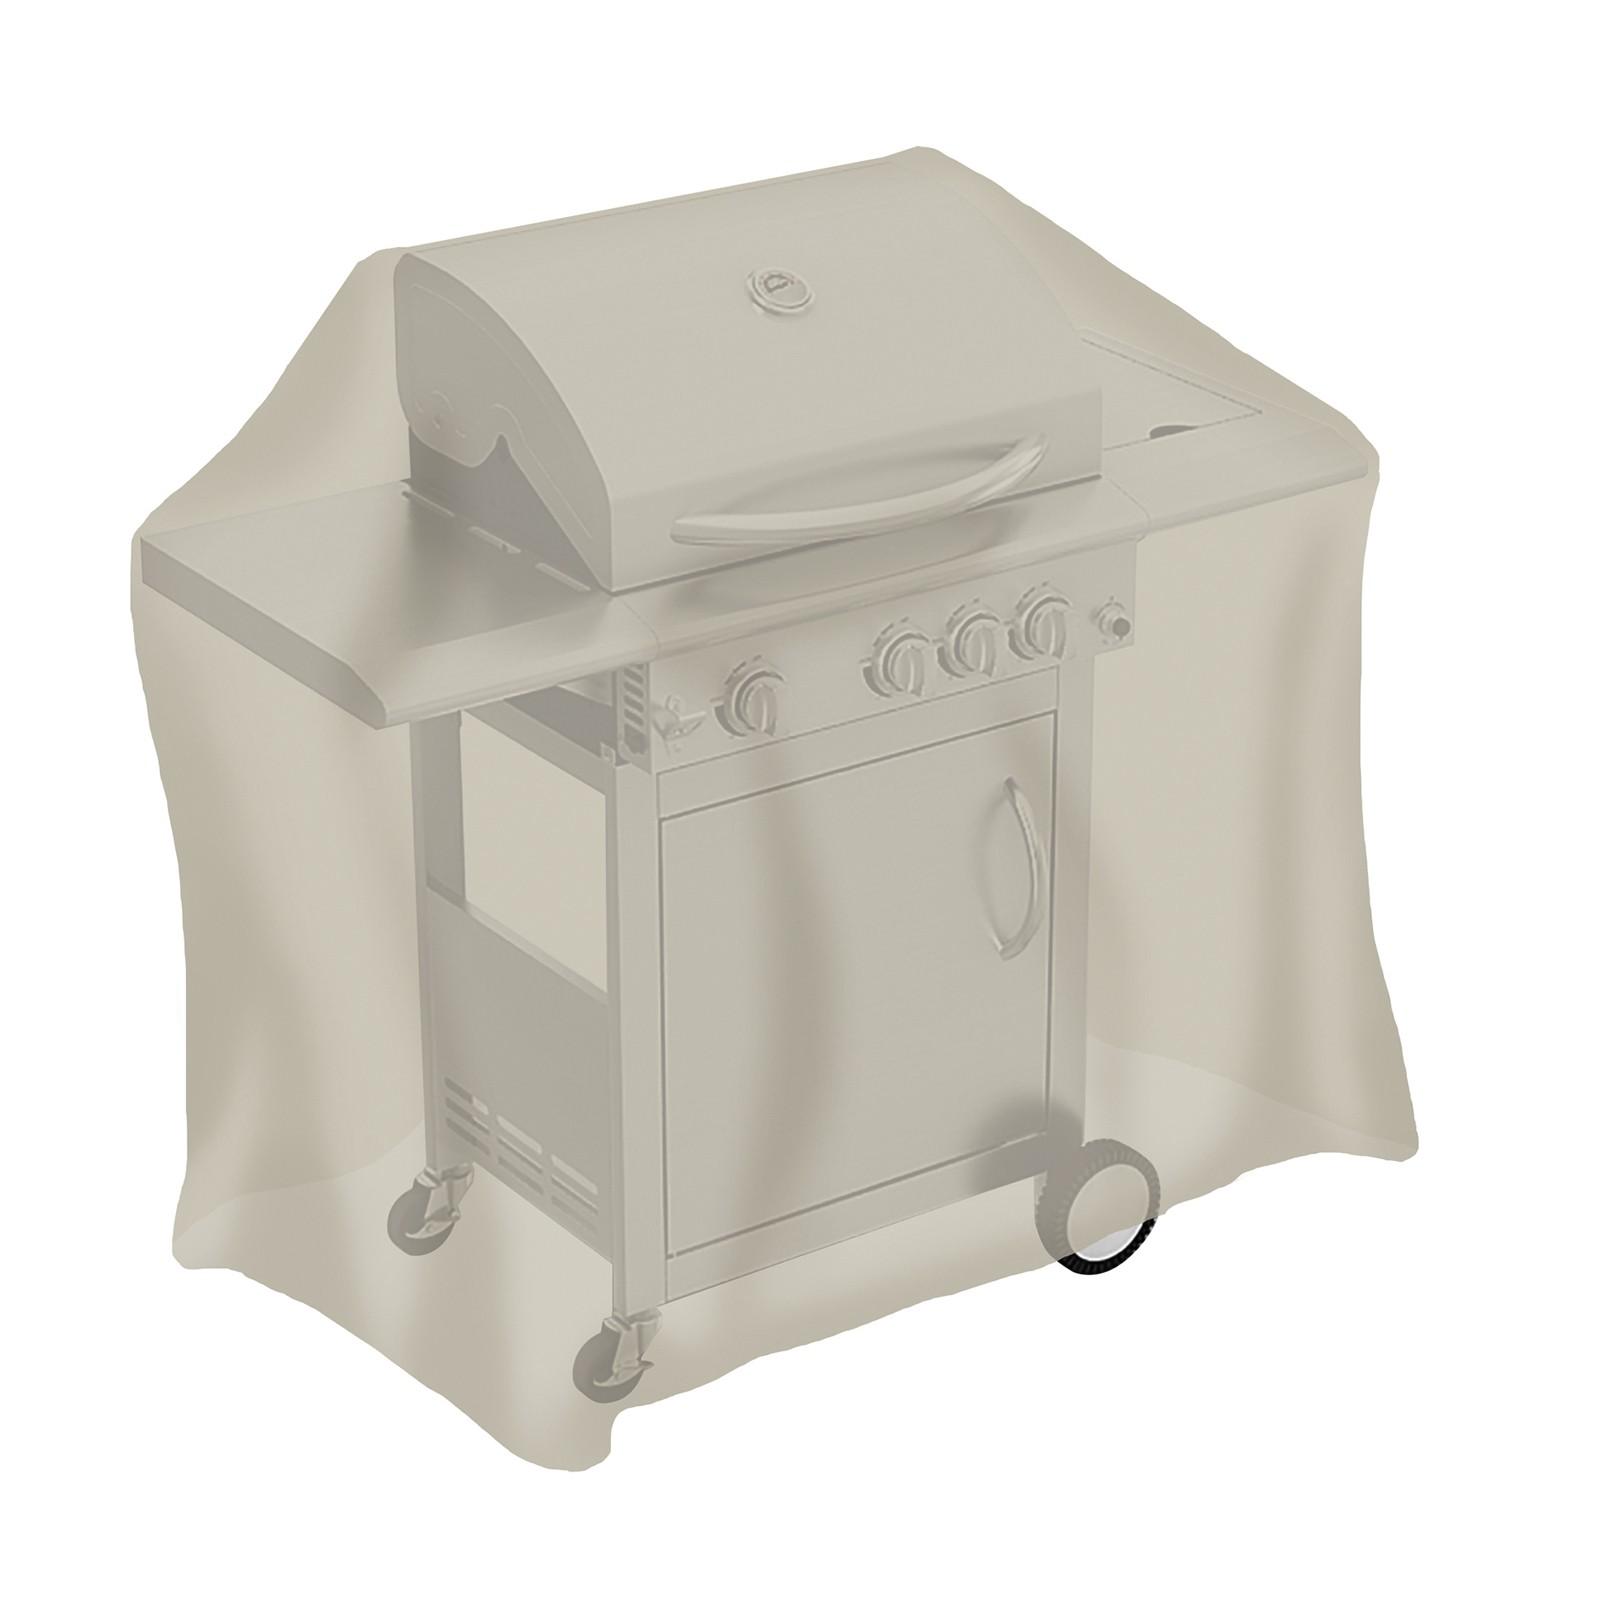 tepro gasgrill universal abdeckhaube schutzh lle beige. Black Bedroom Furniture Sets. Home Design Ideas